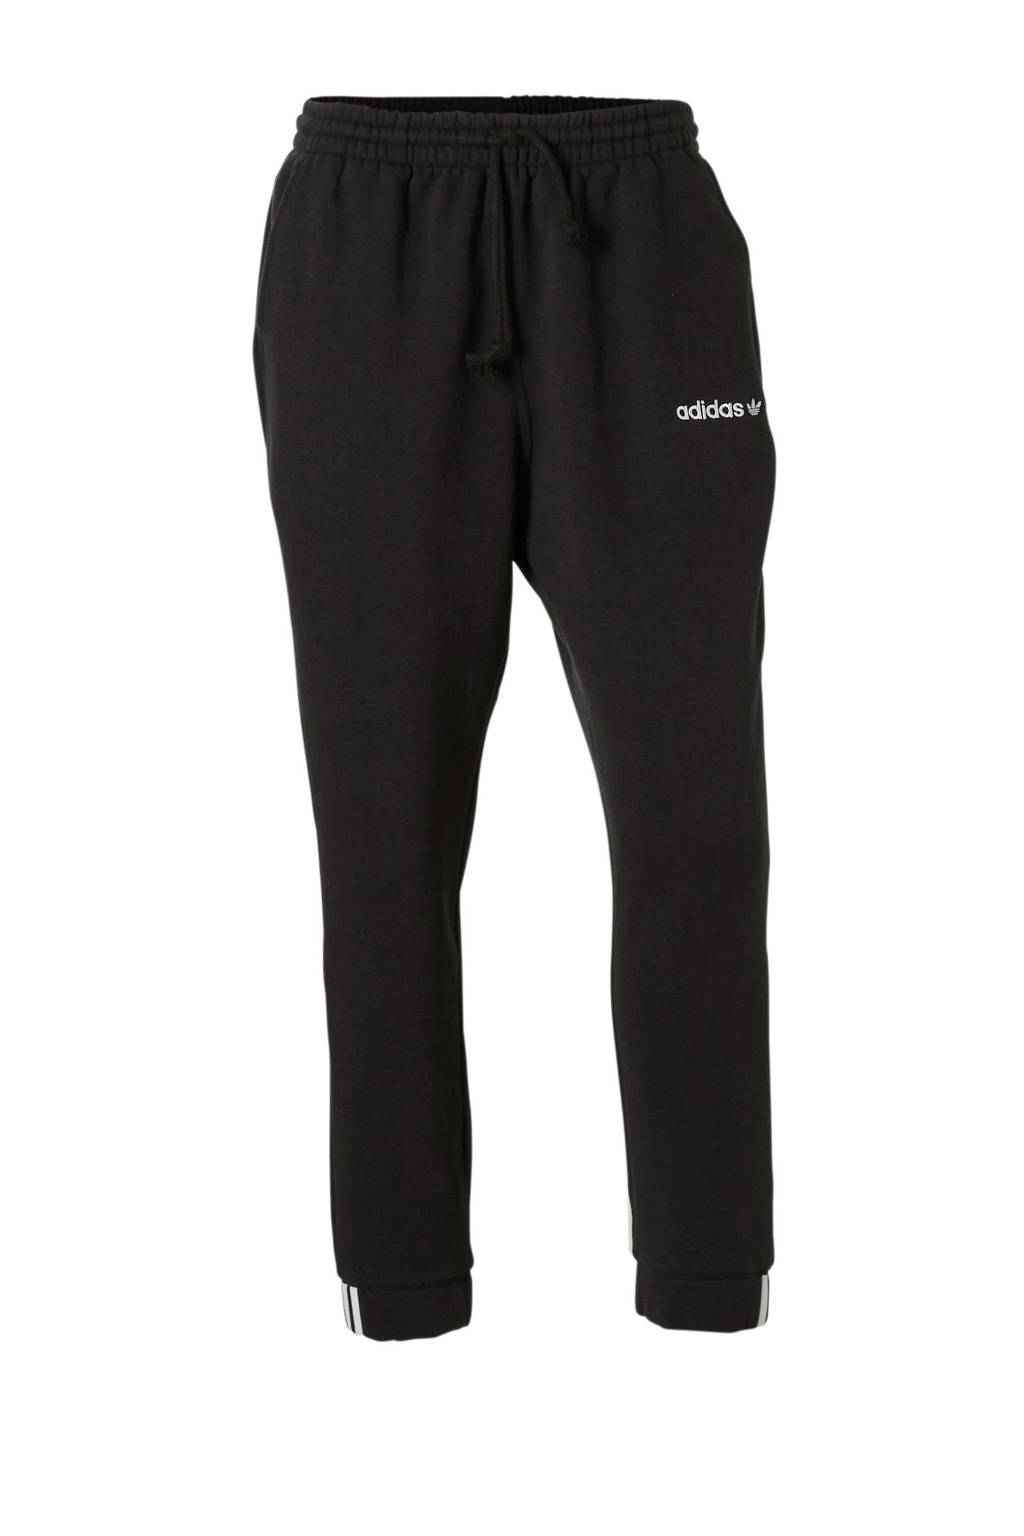 25228aaf3d1 adidas originals joggingbroek zwart   wehkamp